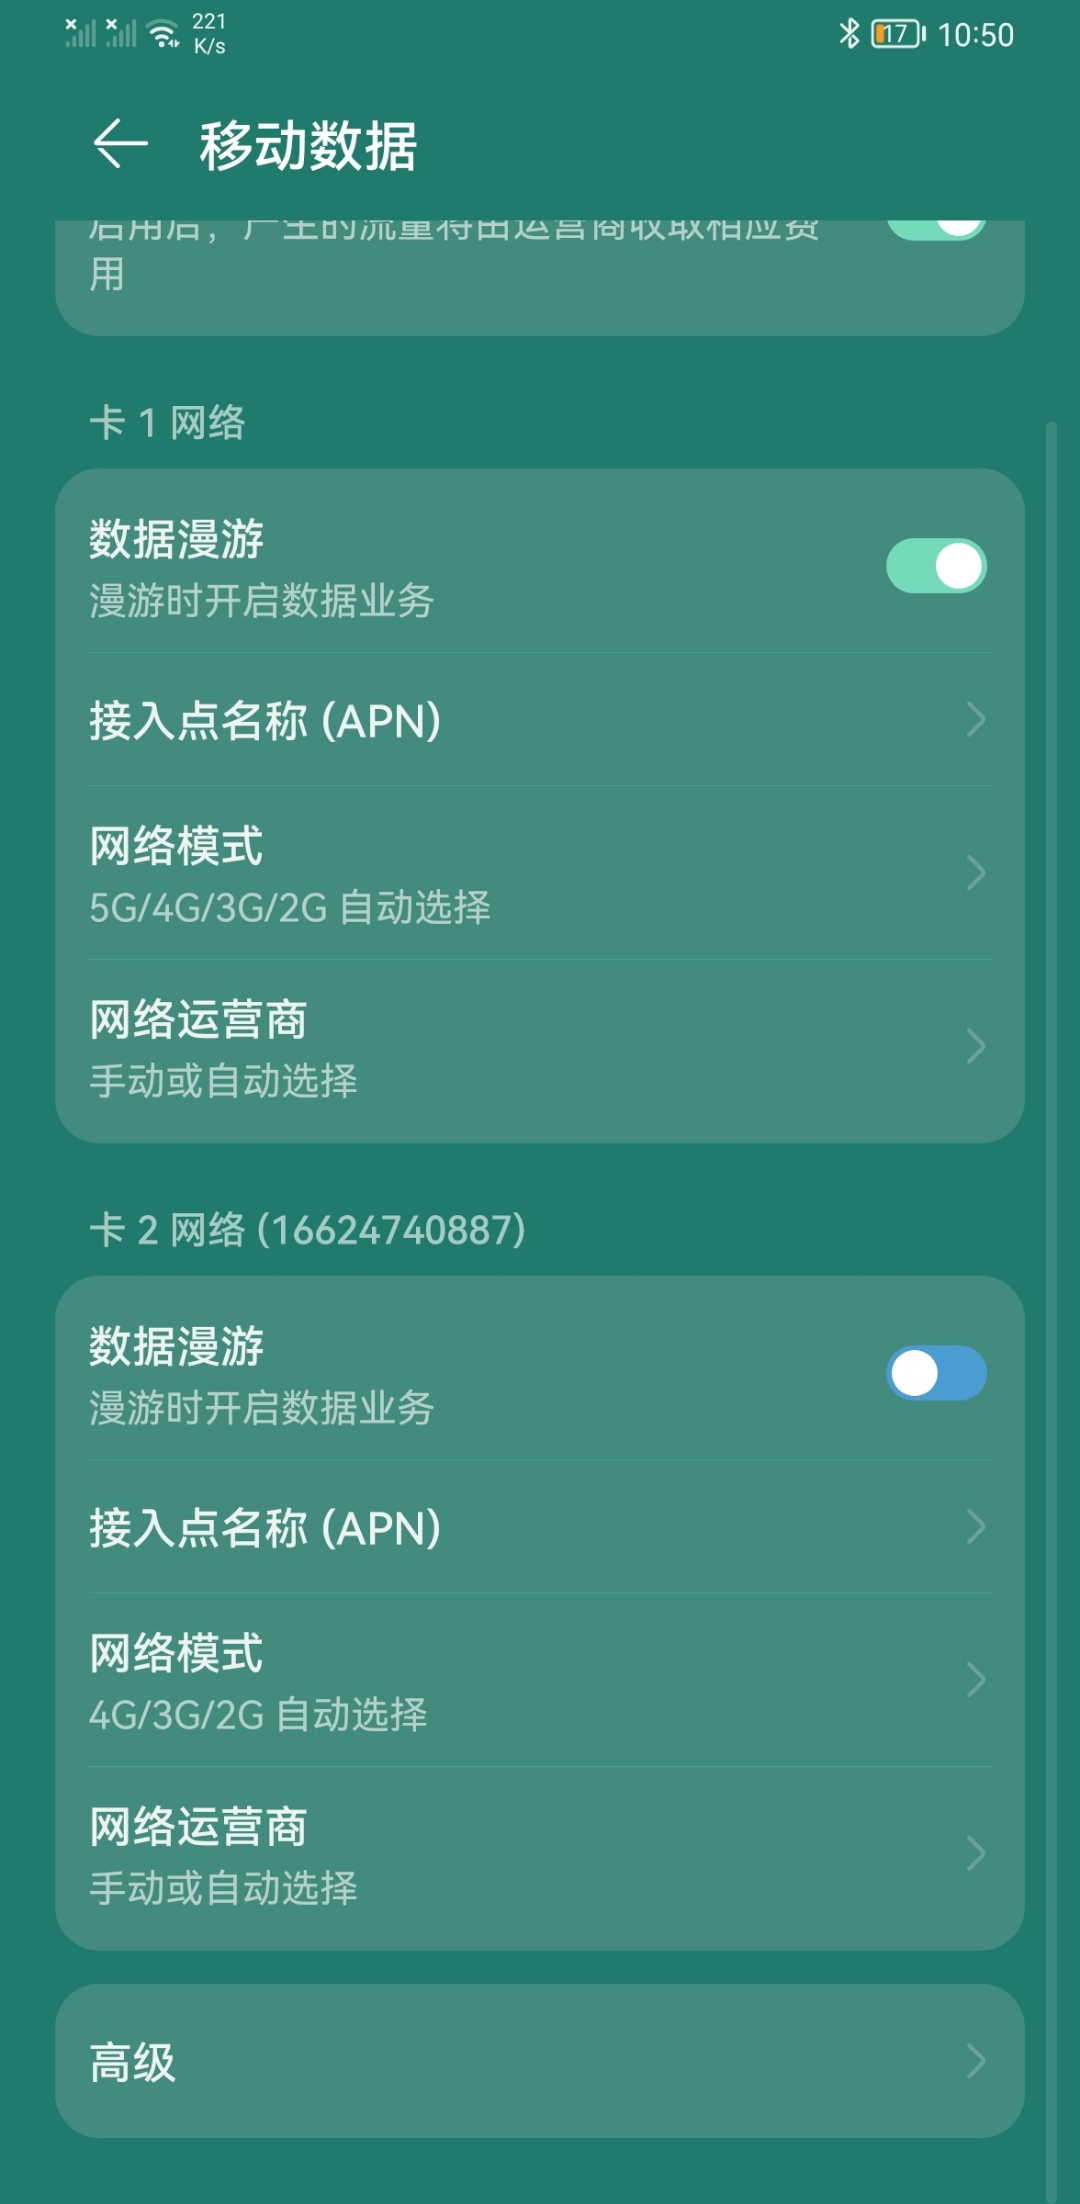 Screenshot_20210611_225034_com.android.phone.jpg